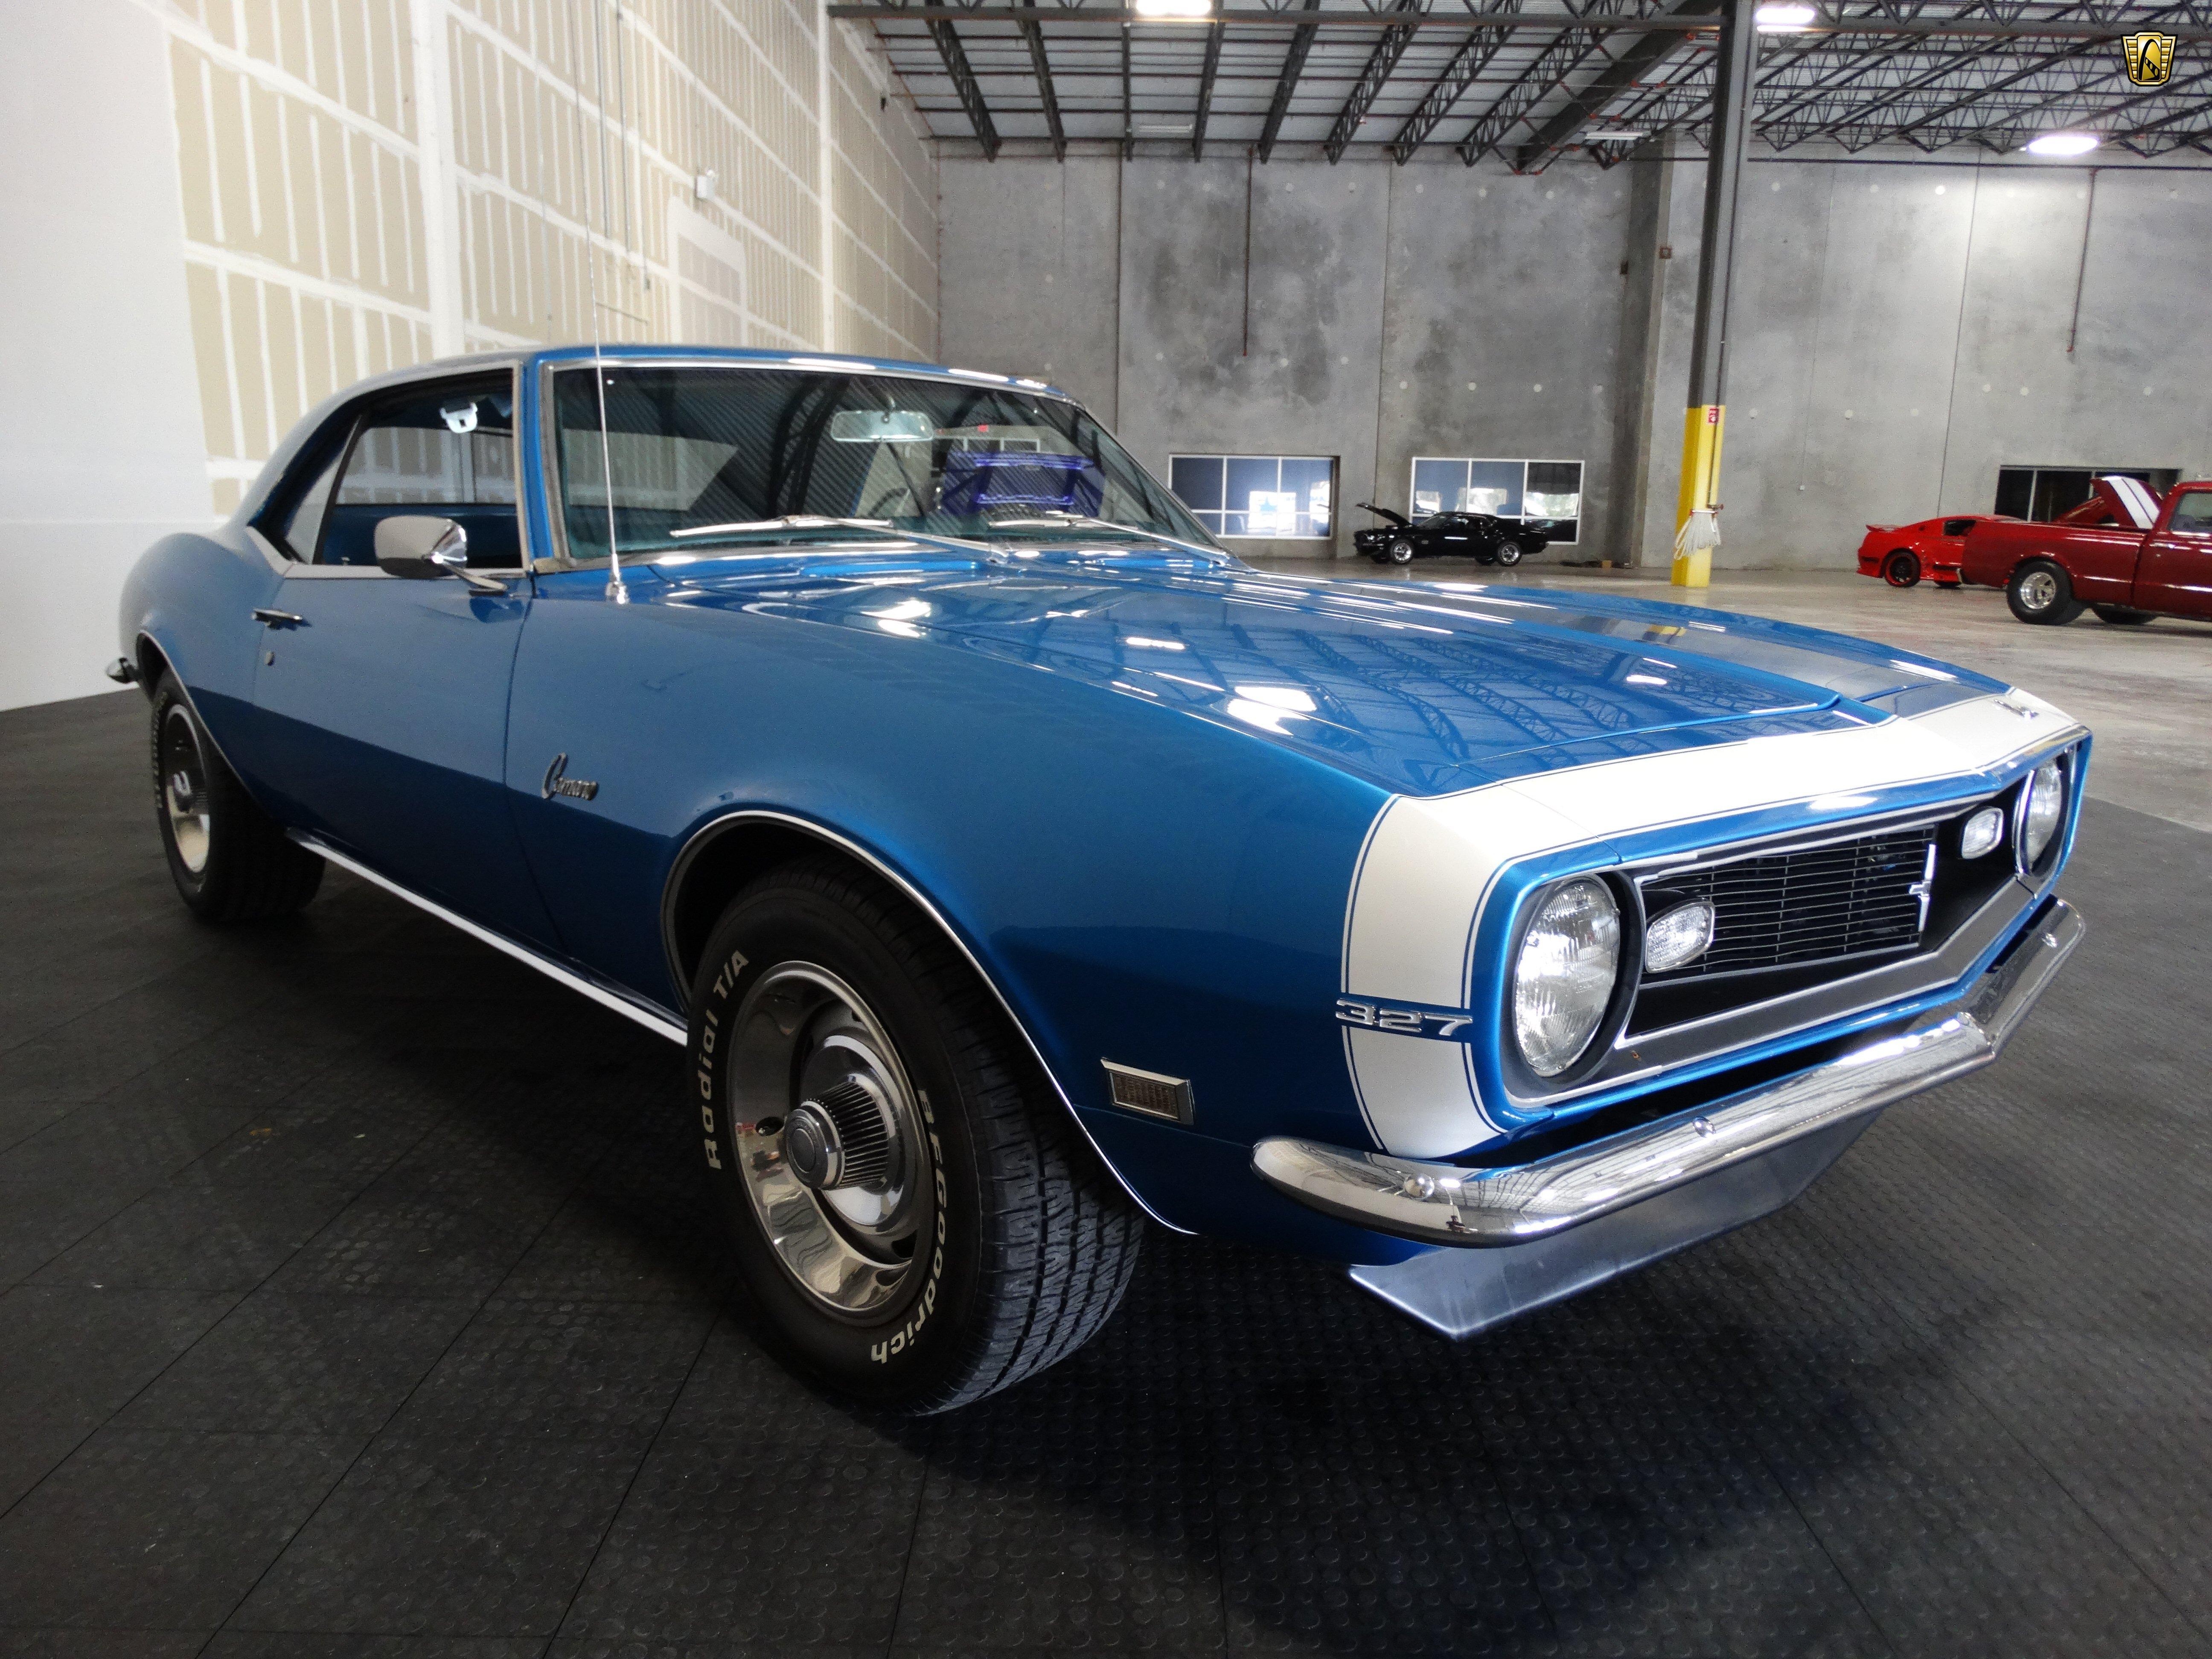 1968 Chevrolet Camaro 327 Blue Cars Wallpaper 5184x3888 844377 Wallpaperup